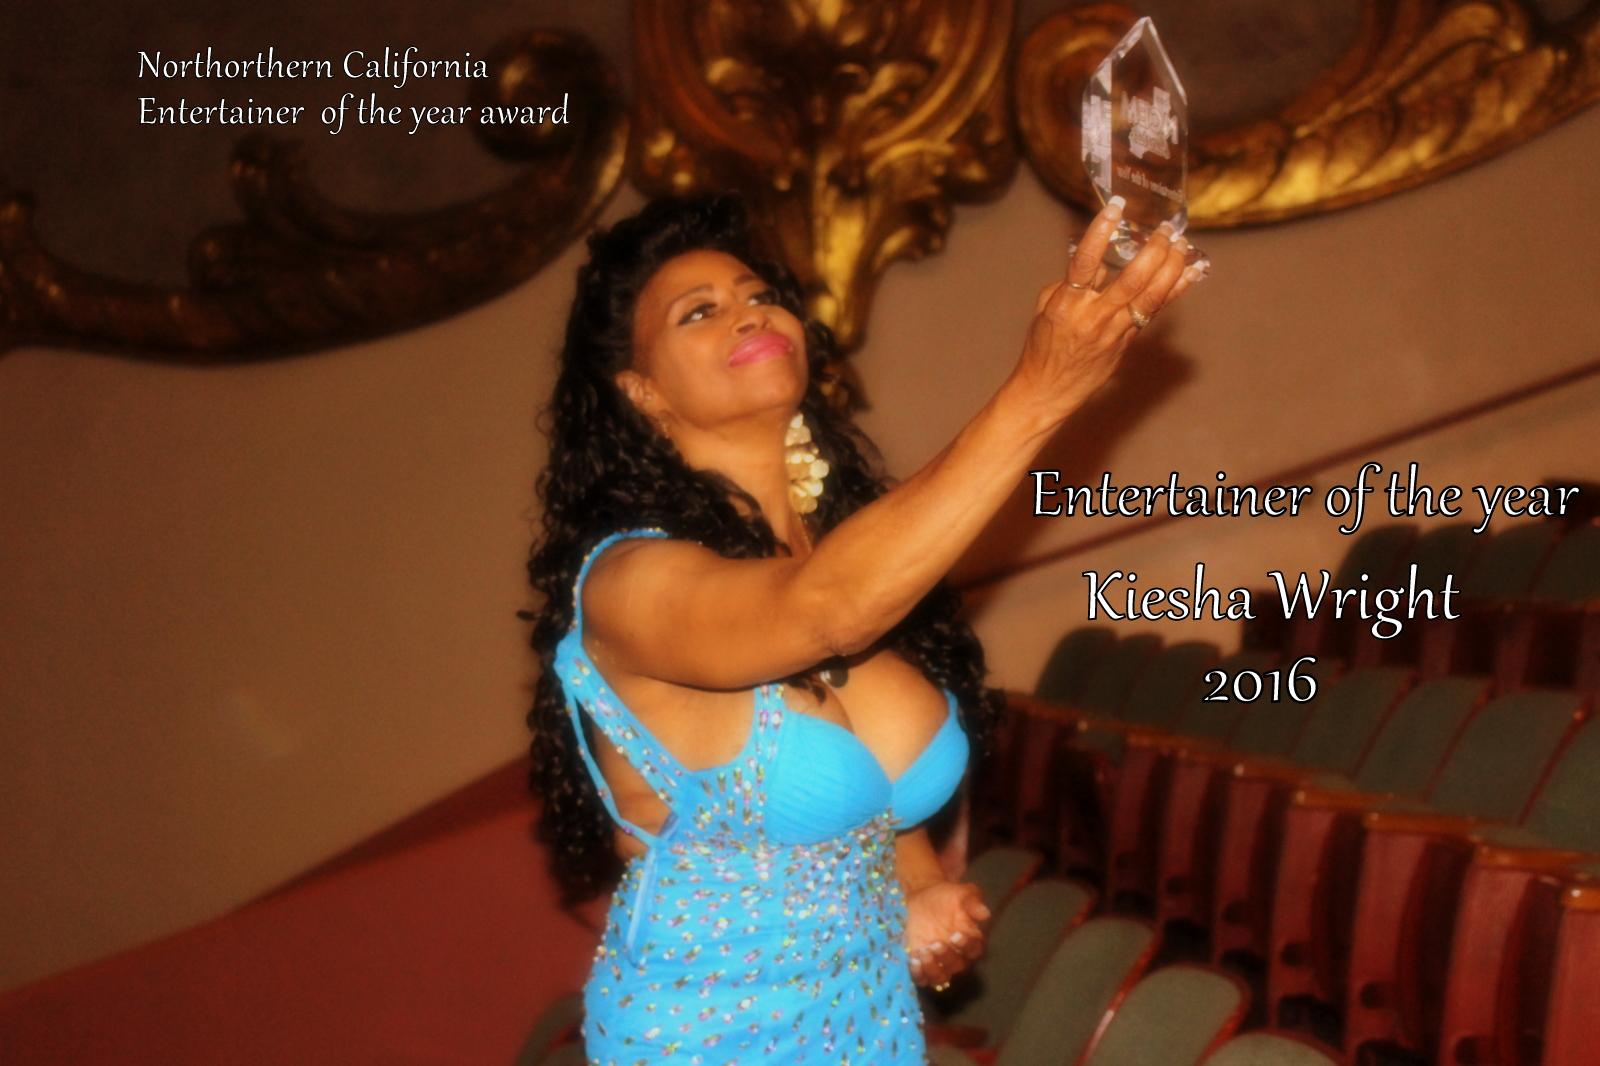 kiesha wright, entertainer of the year, NCEM AWARD